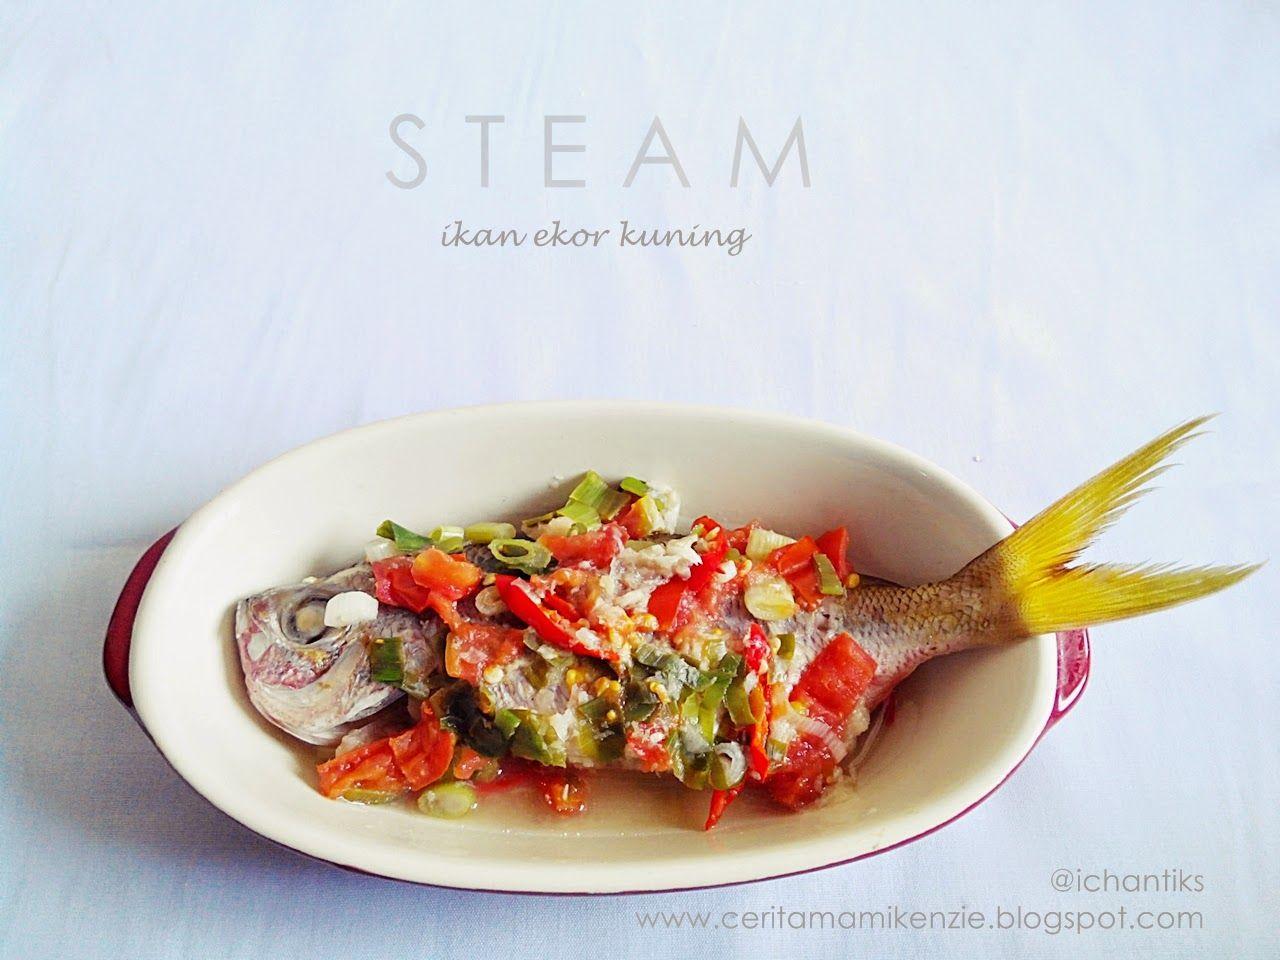 Resep Steam Ikan Resep Ikan Kukus Resep Ikan Ekor Kuning Resep Ikan Ekor Kuning Kukus Resep Seafood Resep Makanan Resep Masakan